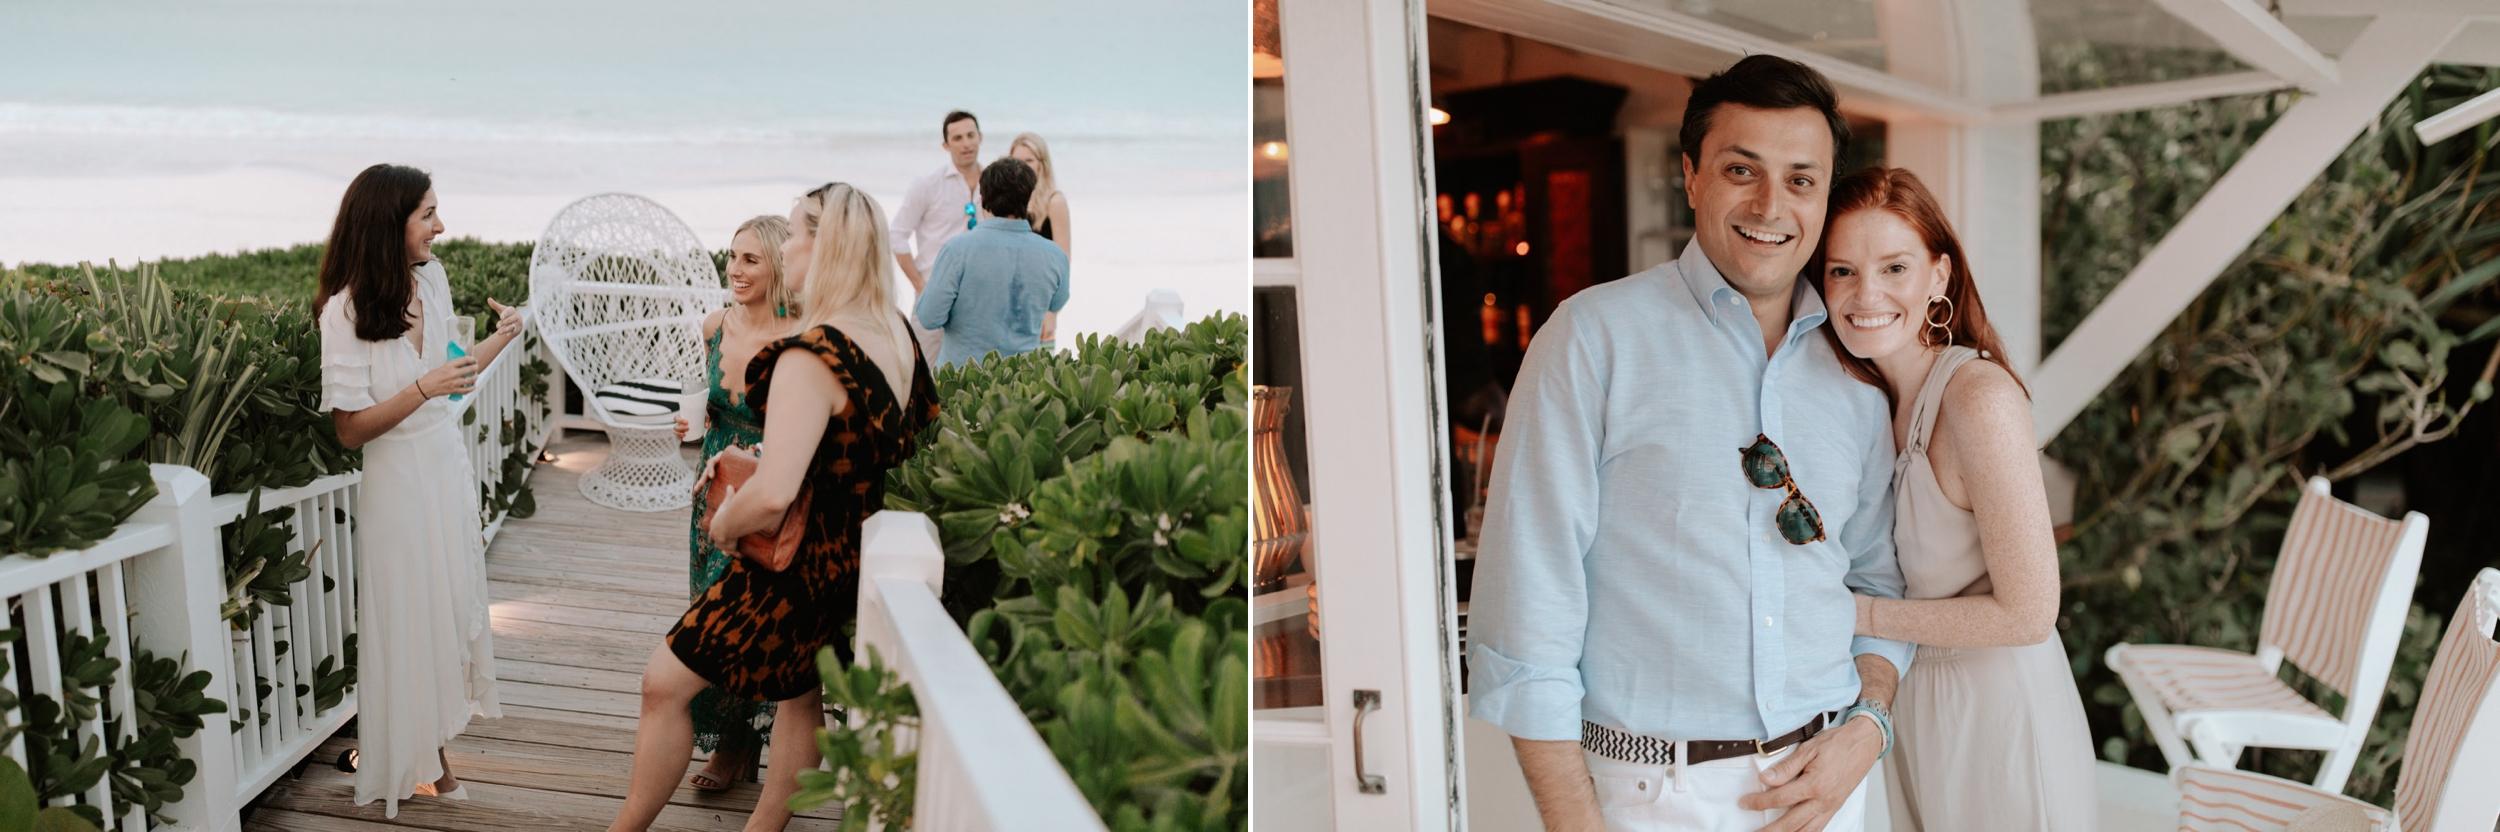 Harbour-Island-Ocean-View-Club-Wedding-Photographer_31.jpg